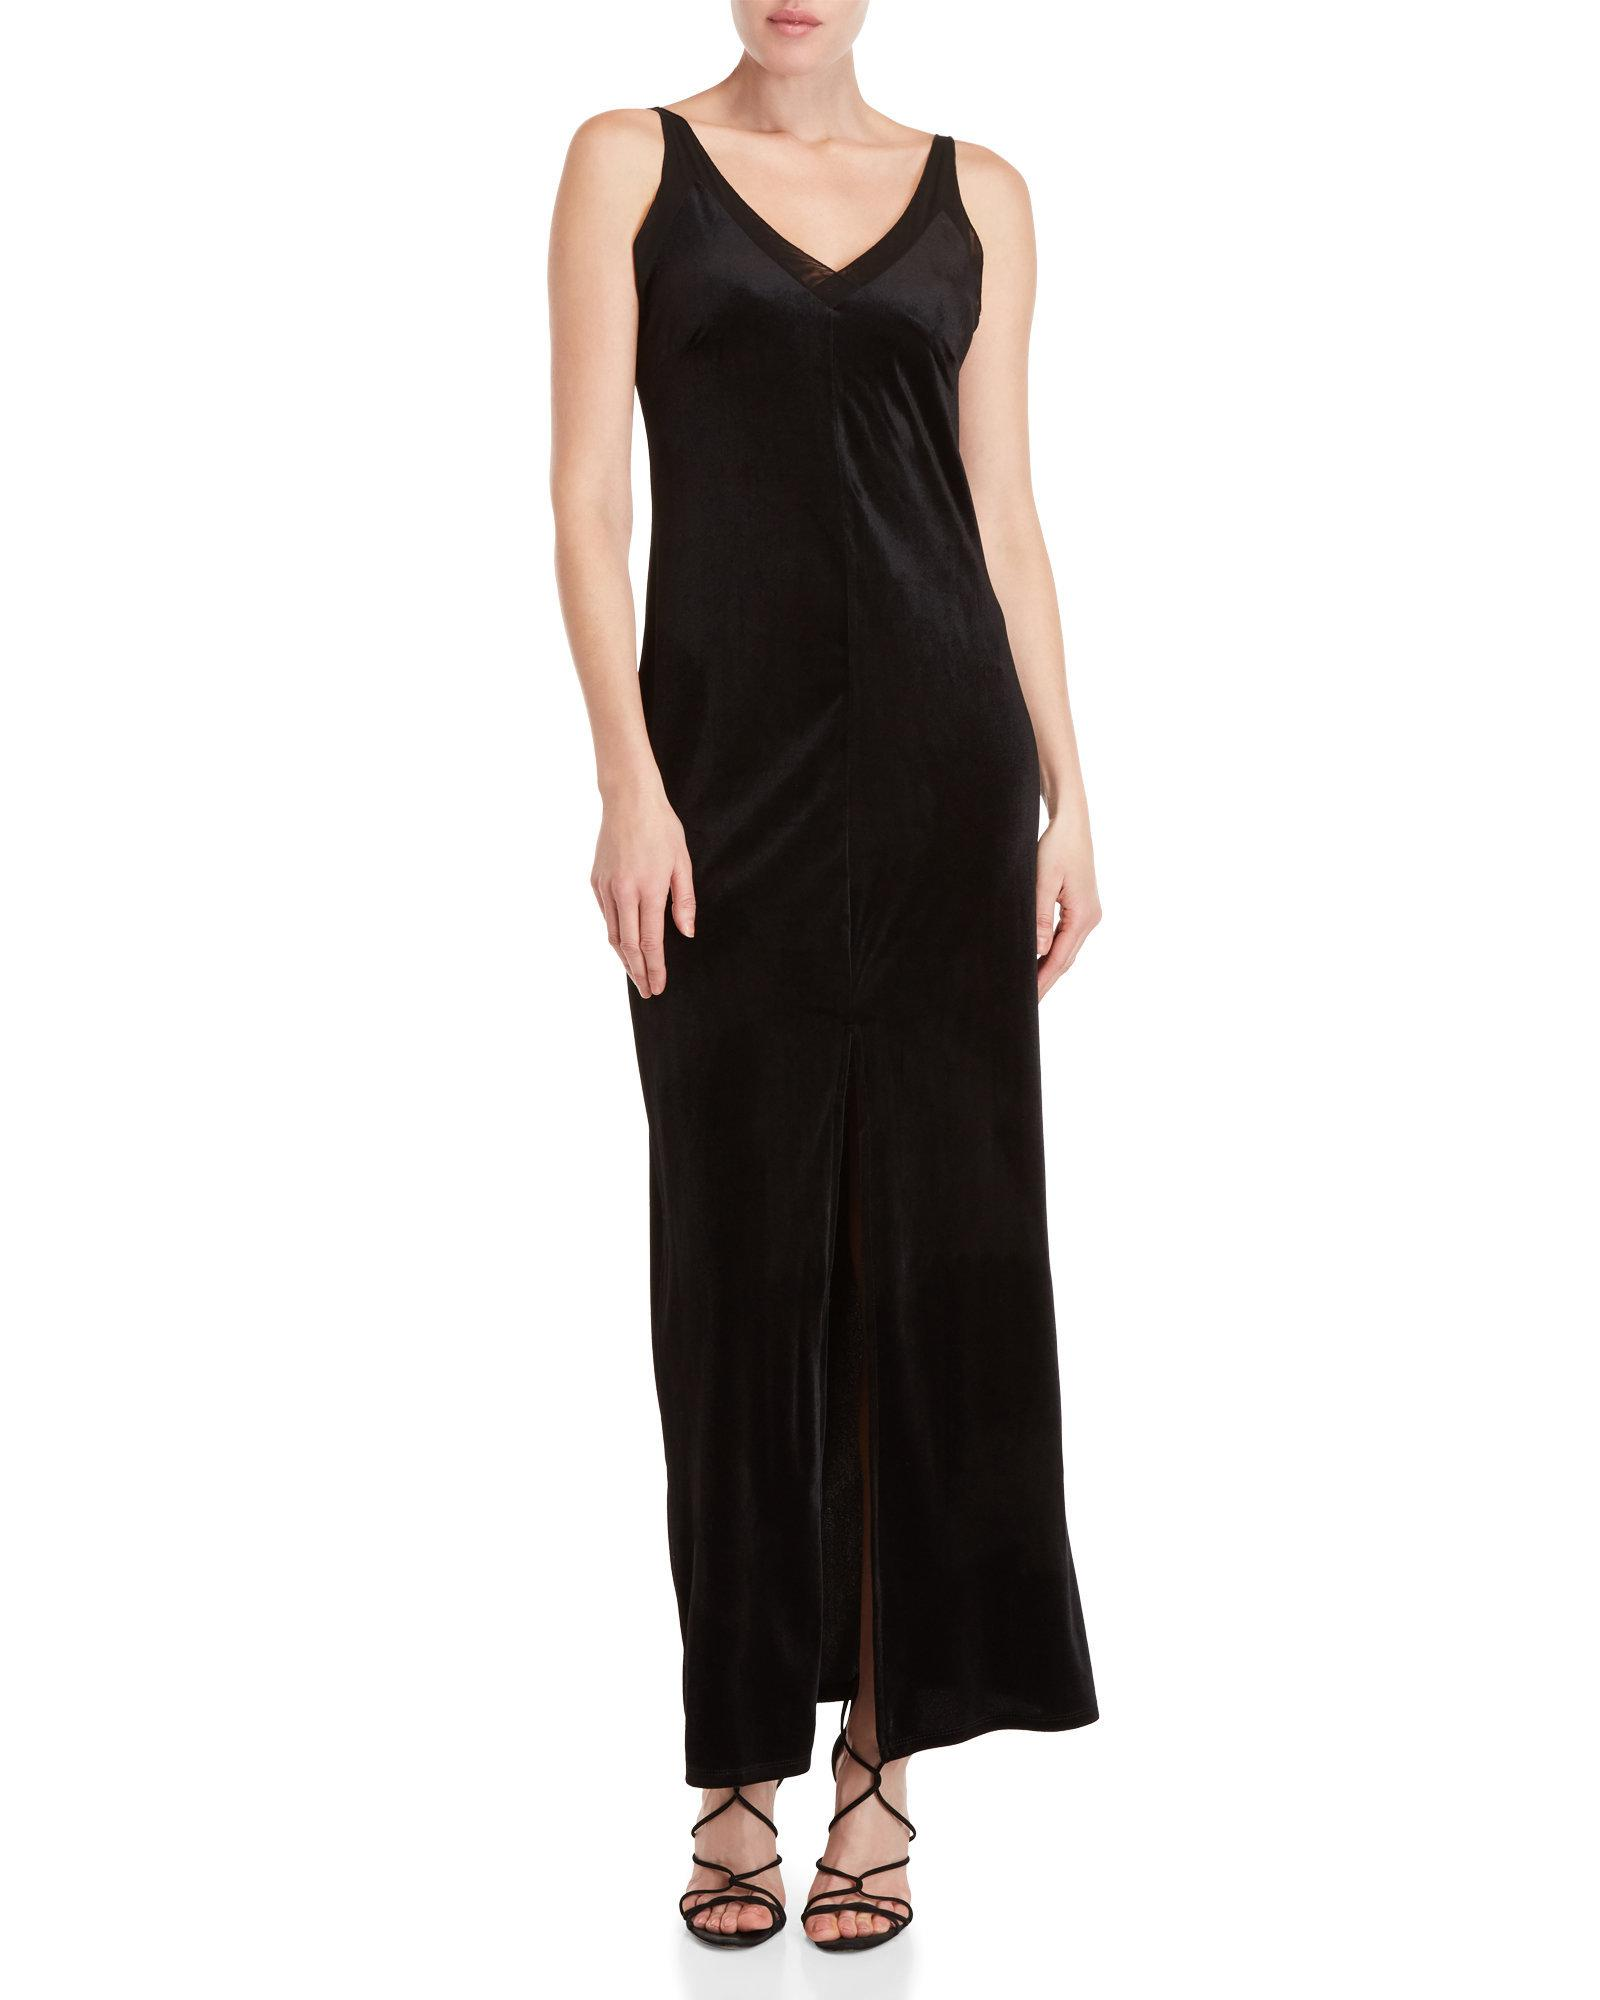 4d35ed247d6 Lyst - Romeo and Juliet Couture Black Velvet Maxi Slip Dress in Black